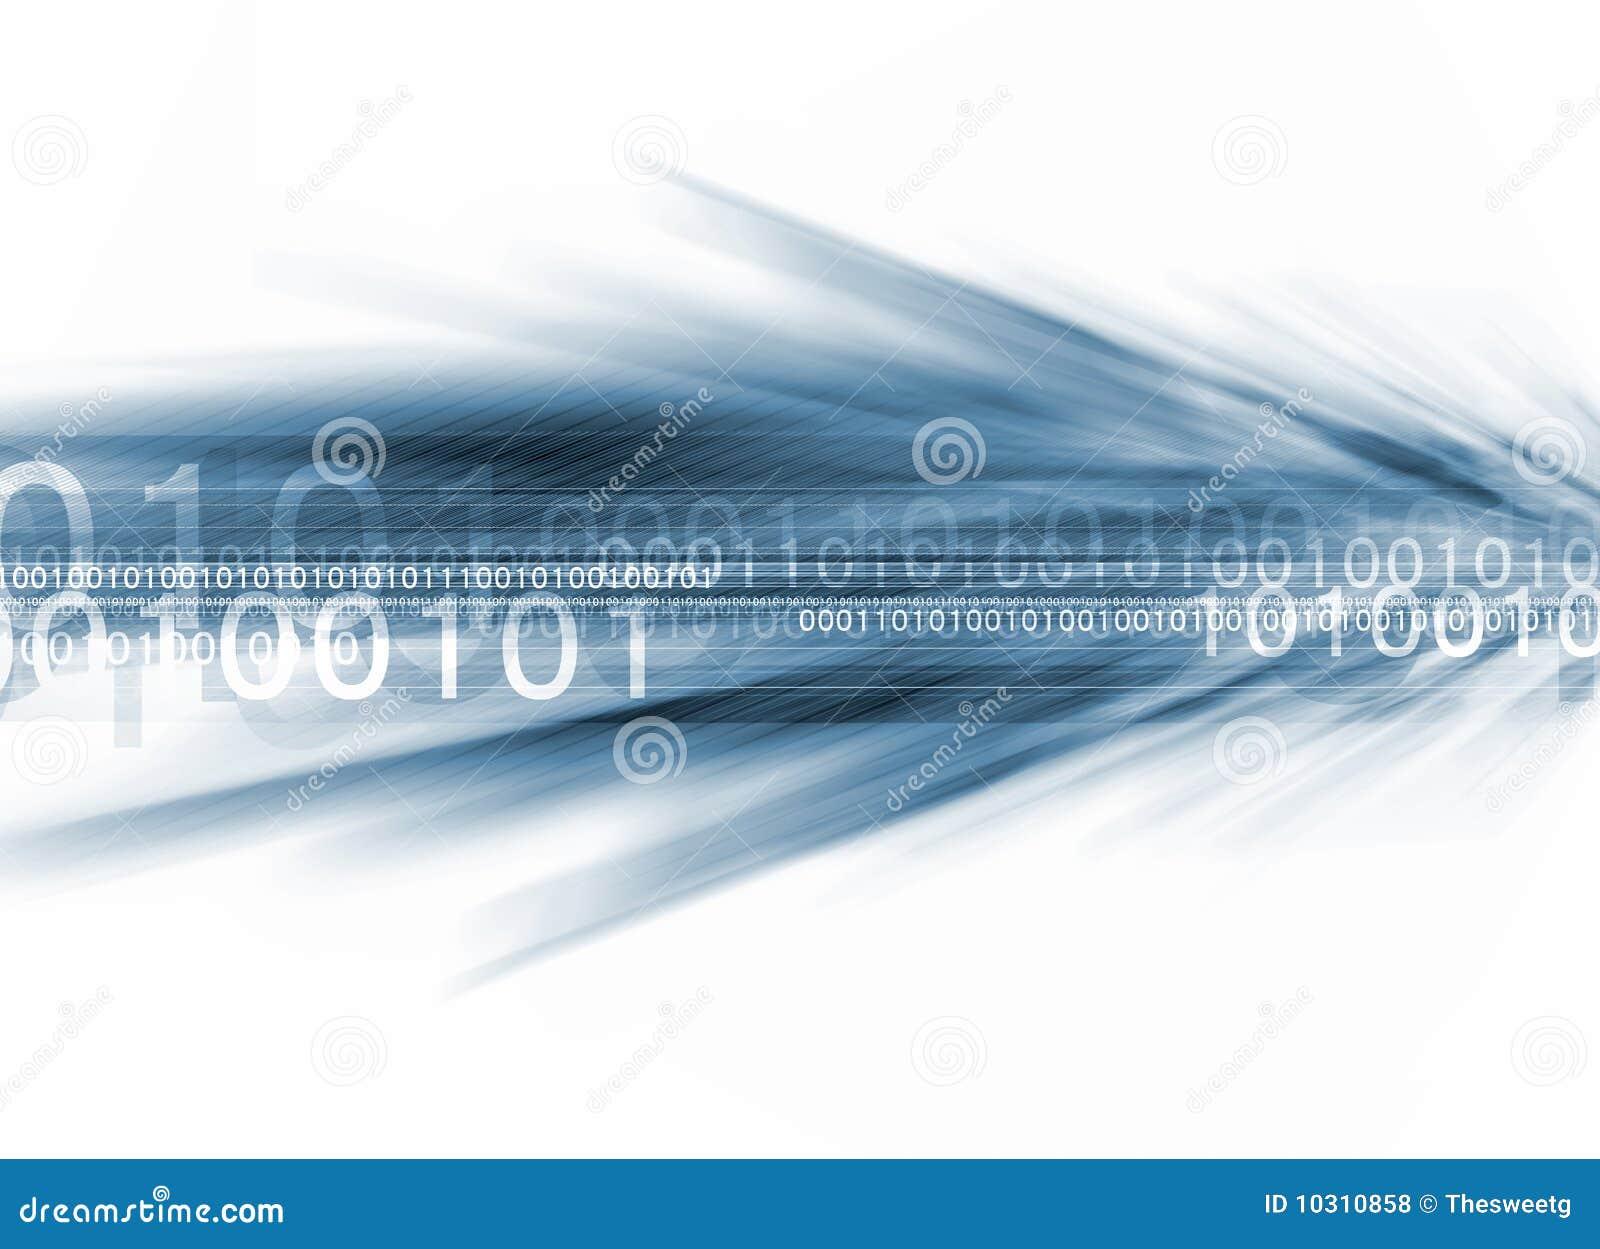 Secuencia binaria